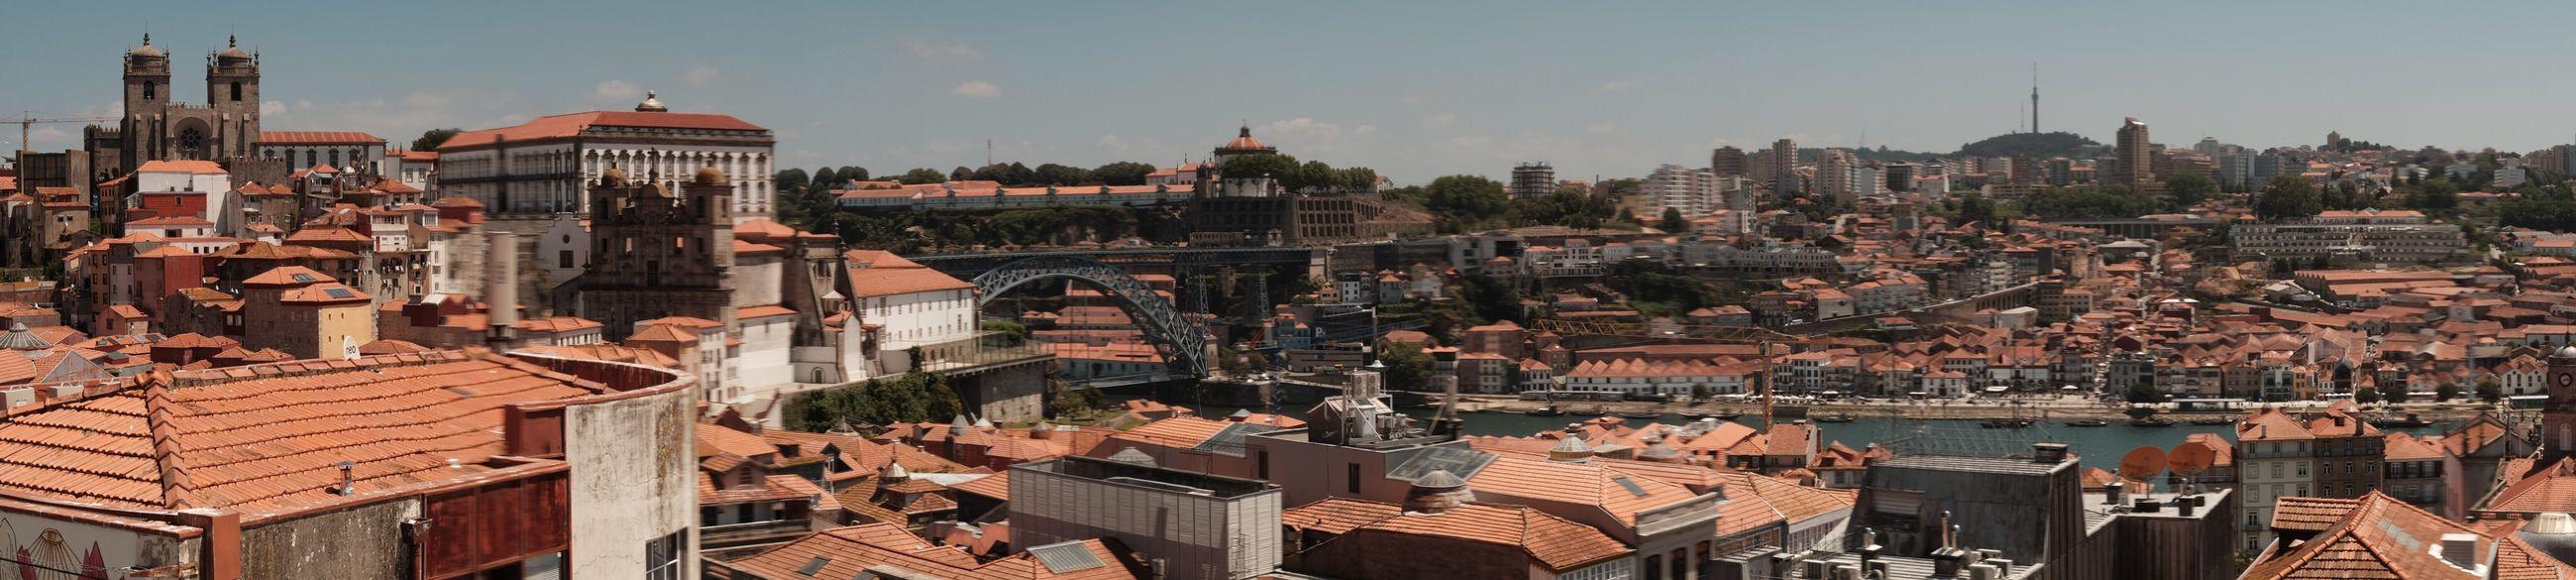 EyeEm Selects porto portugal